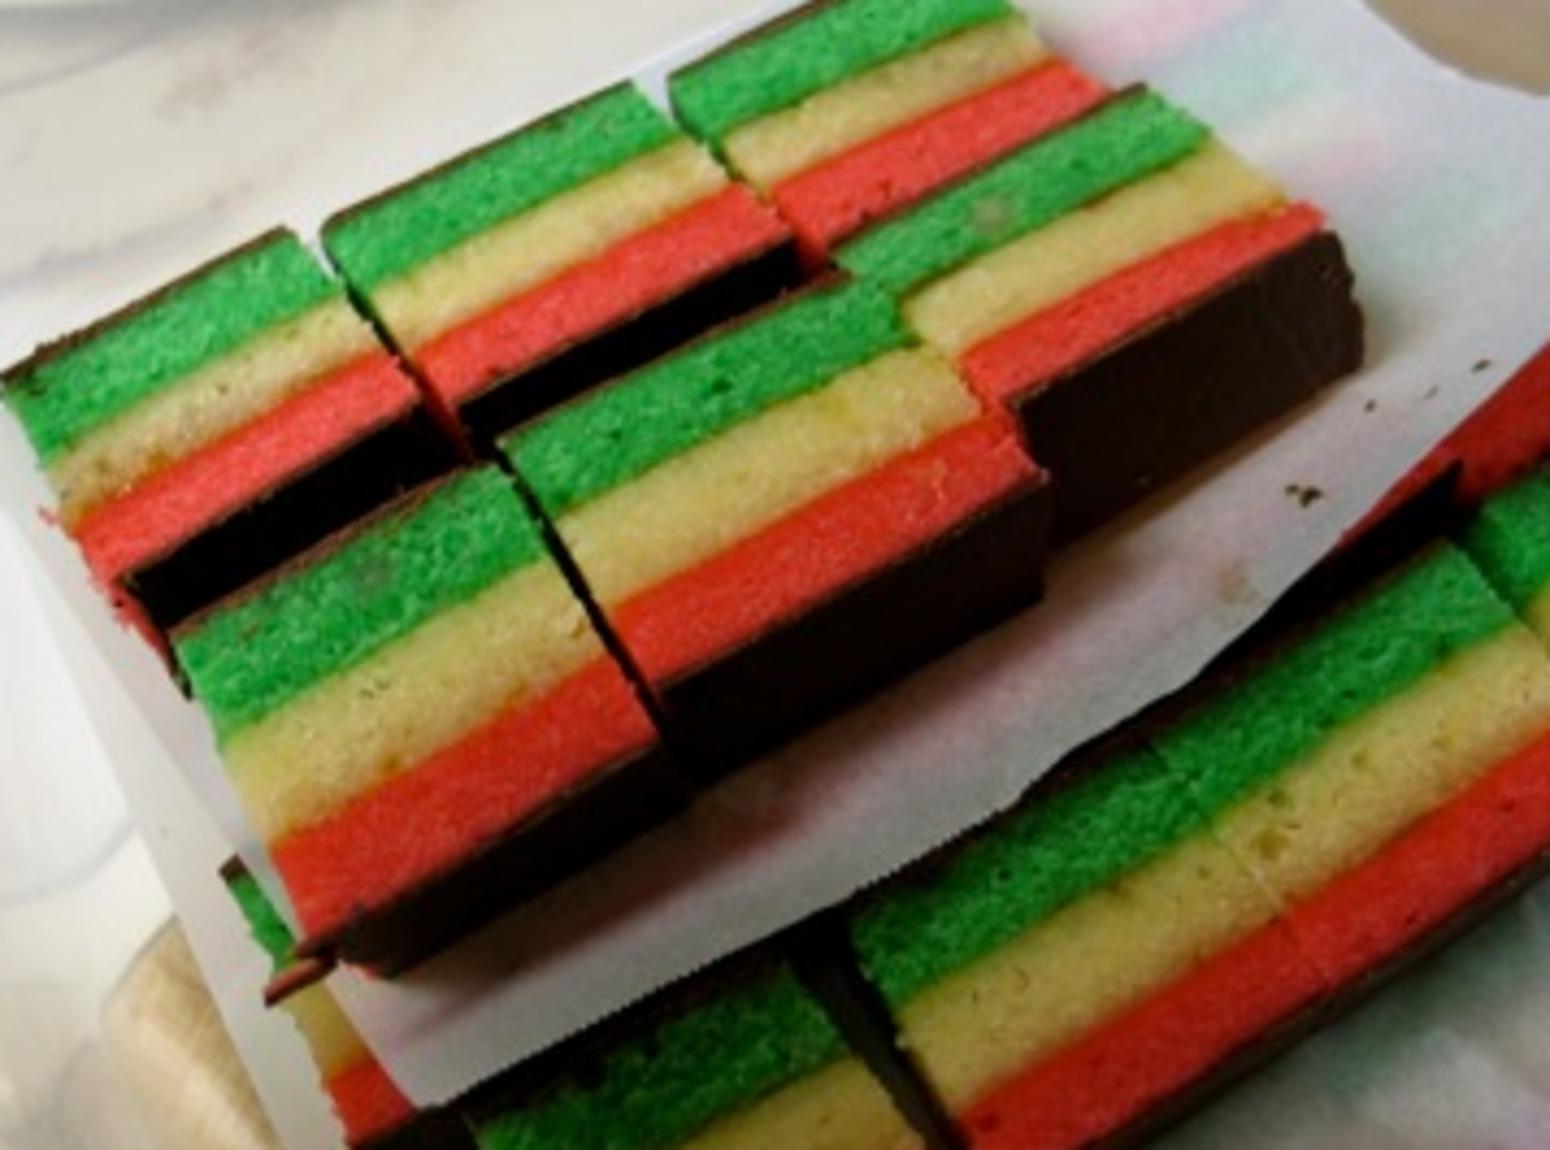 Rainbow Cake Recipe Italian: Art By ASM, It's In There....: Tricolori, Italian Rainbow